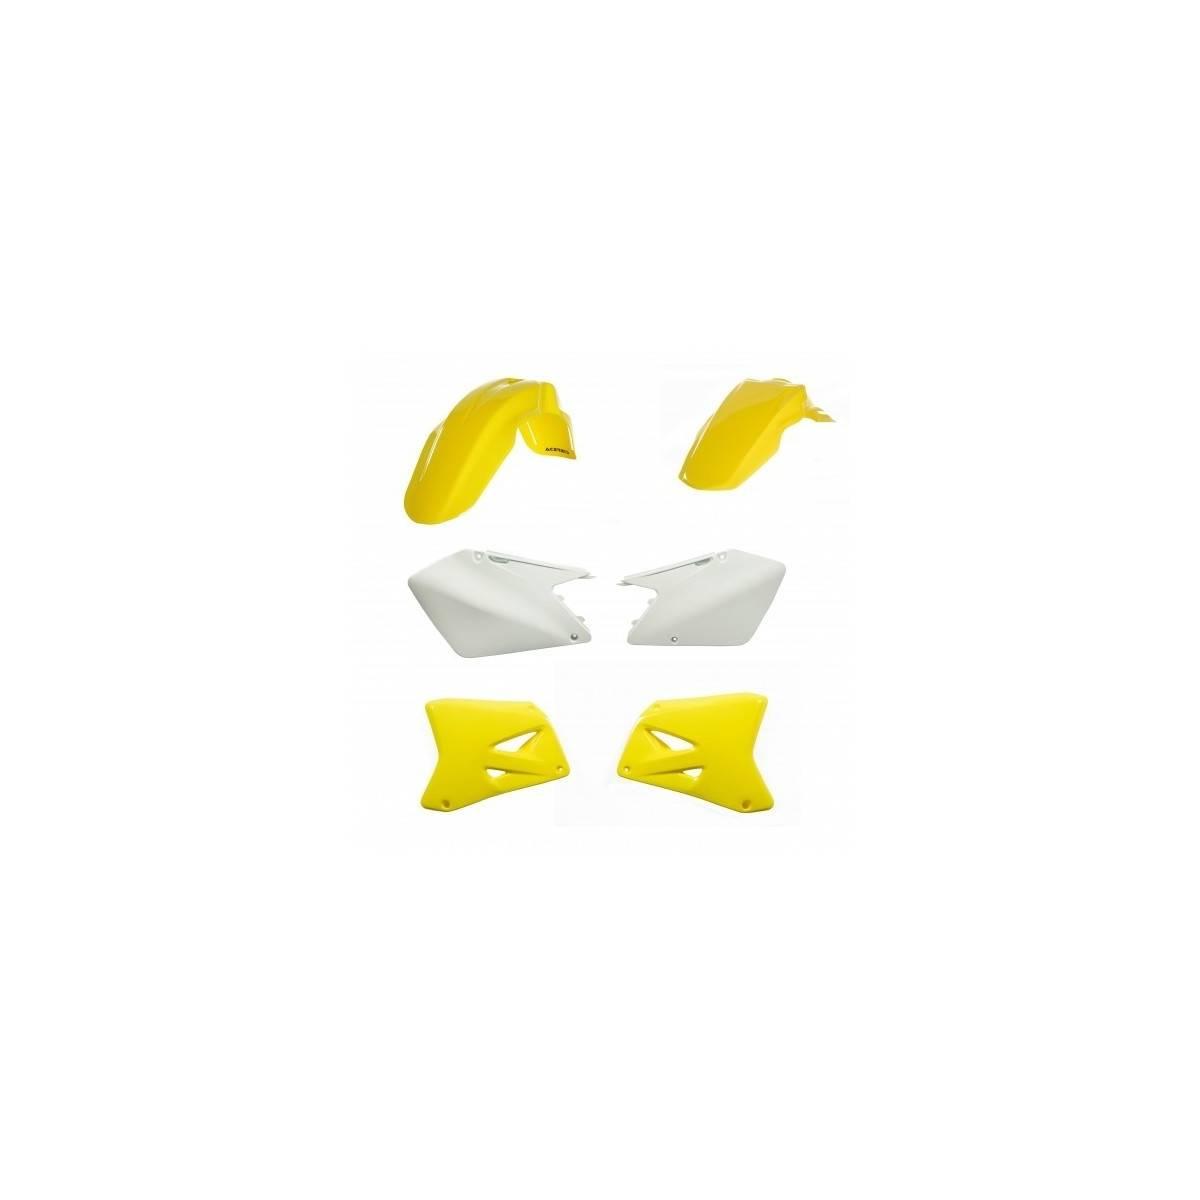 0023066-060 - Kit Plasticos Rmz 450 18 Amarillo